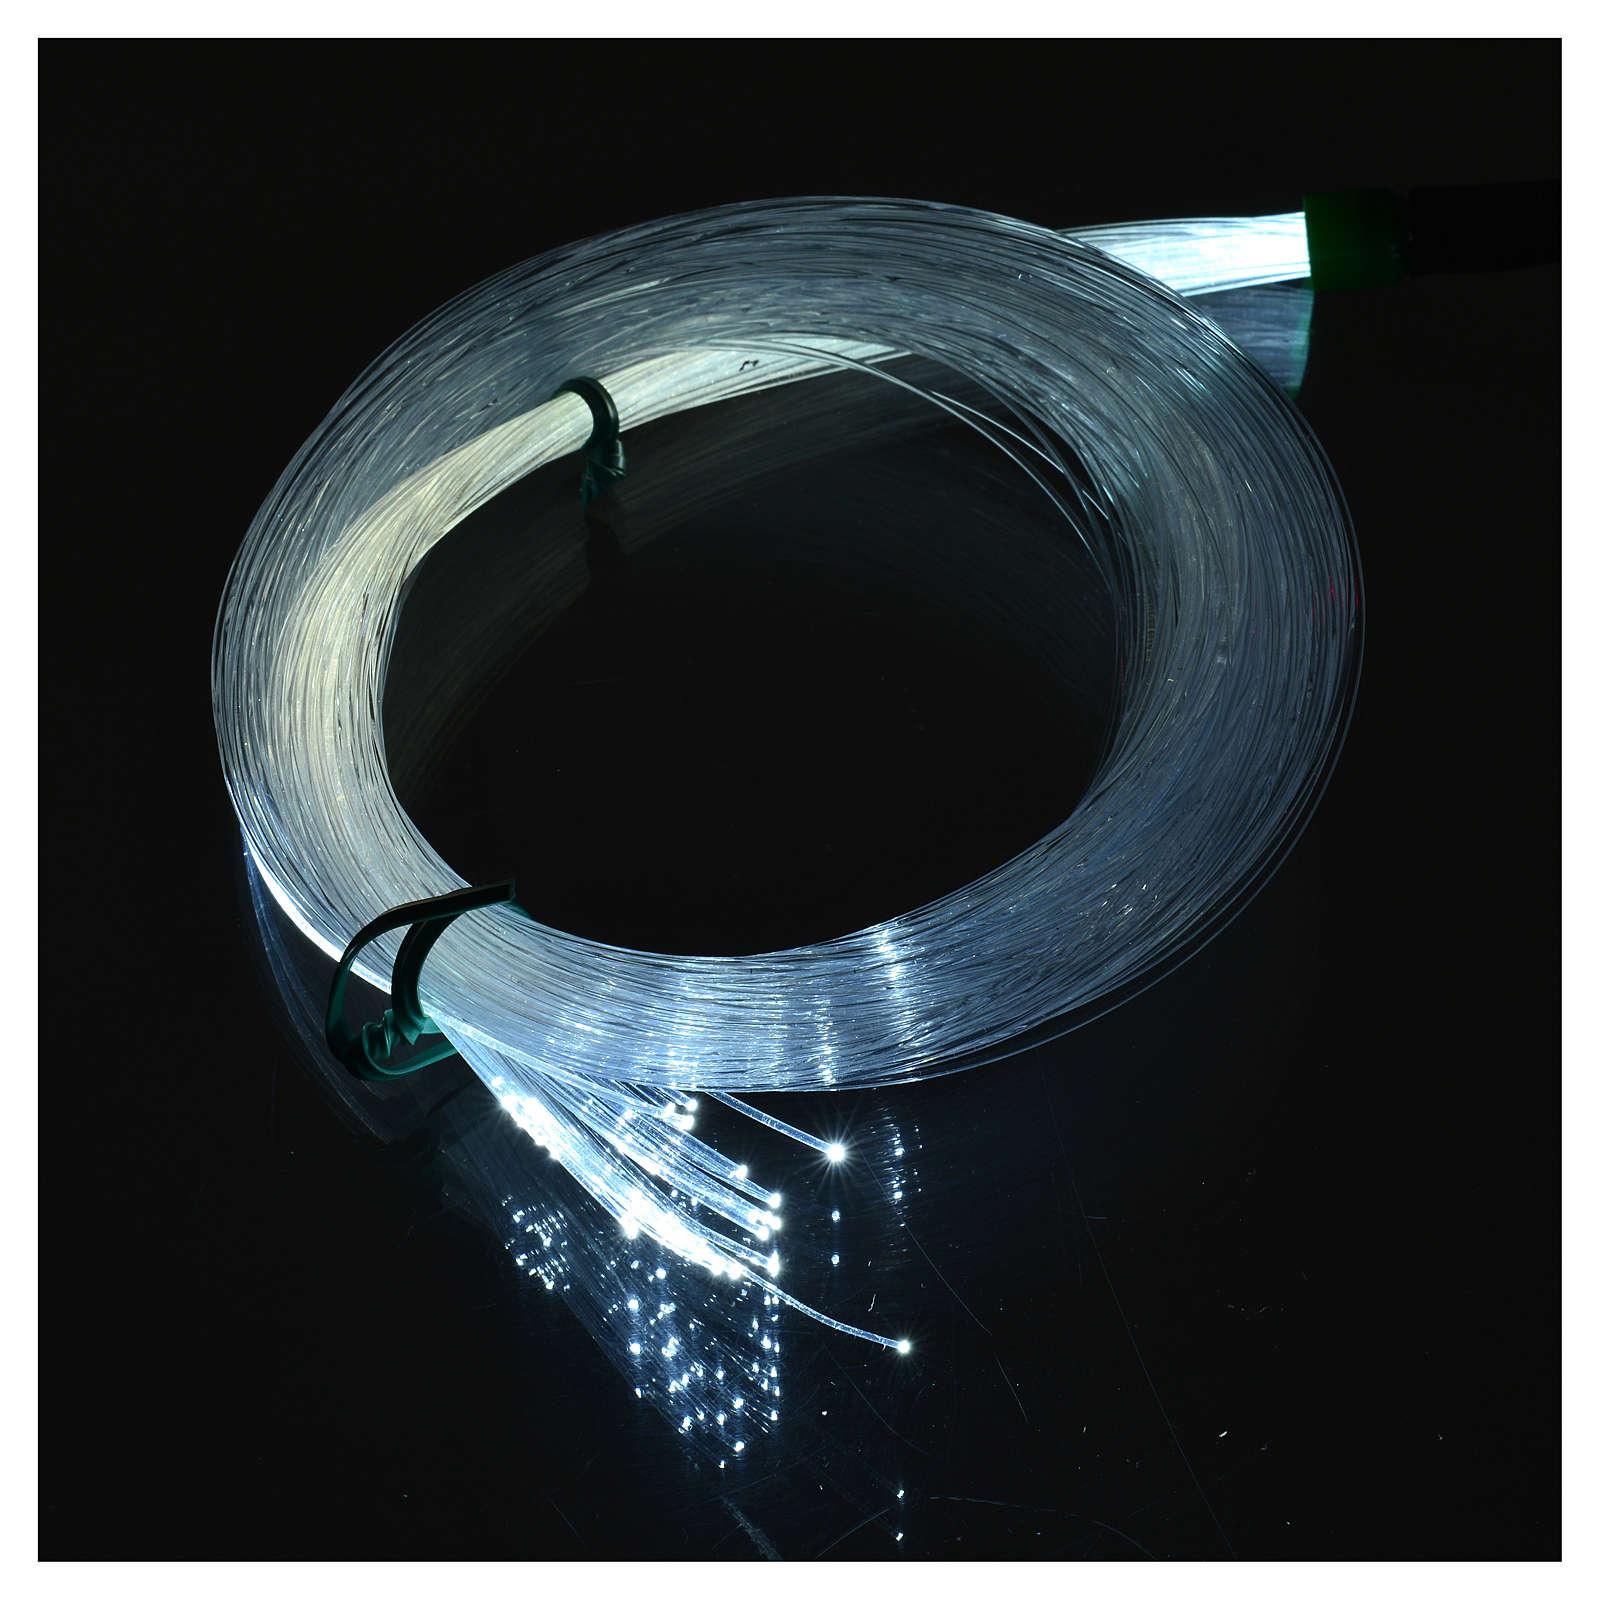 Stelle a fibra ottica 50 fili per centraline serie Frisalight 4